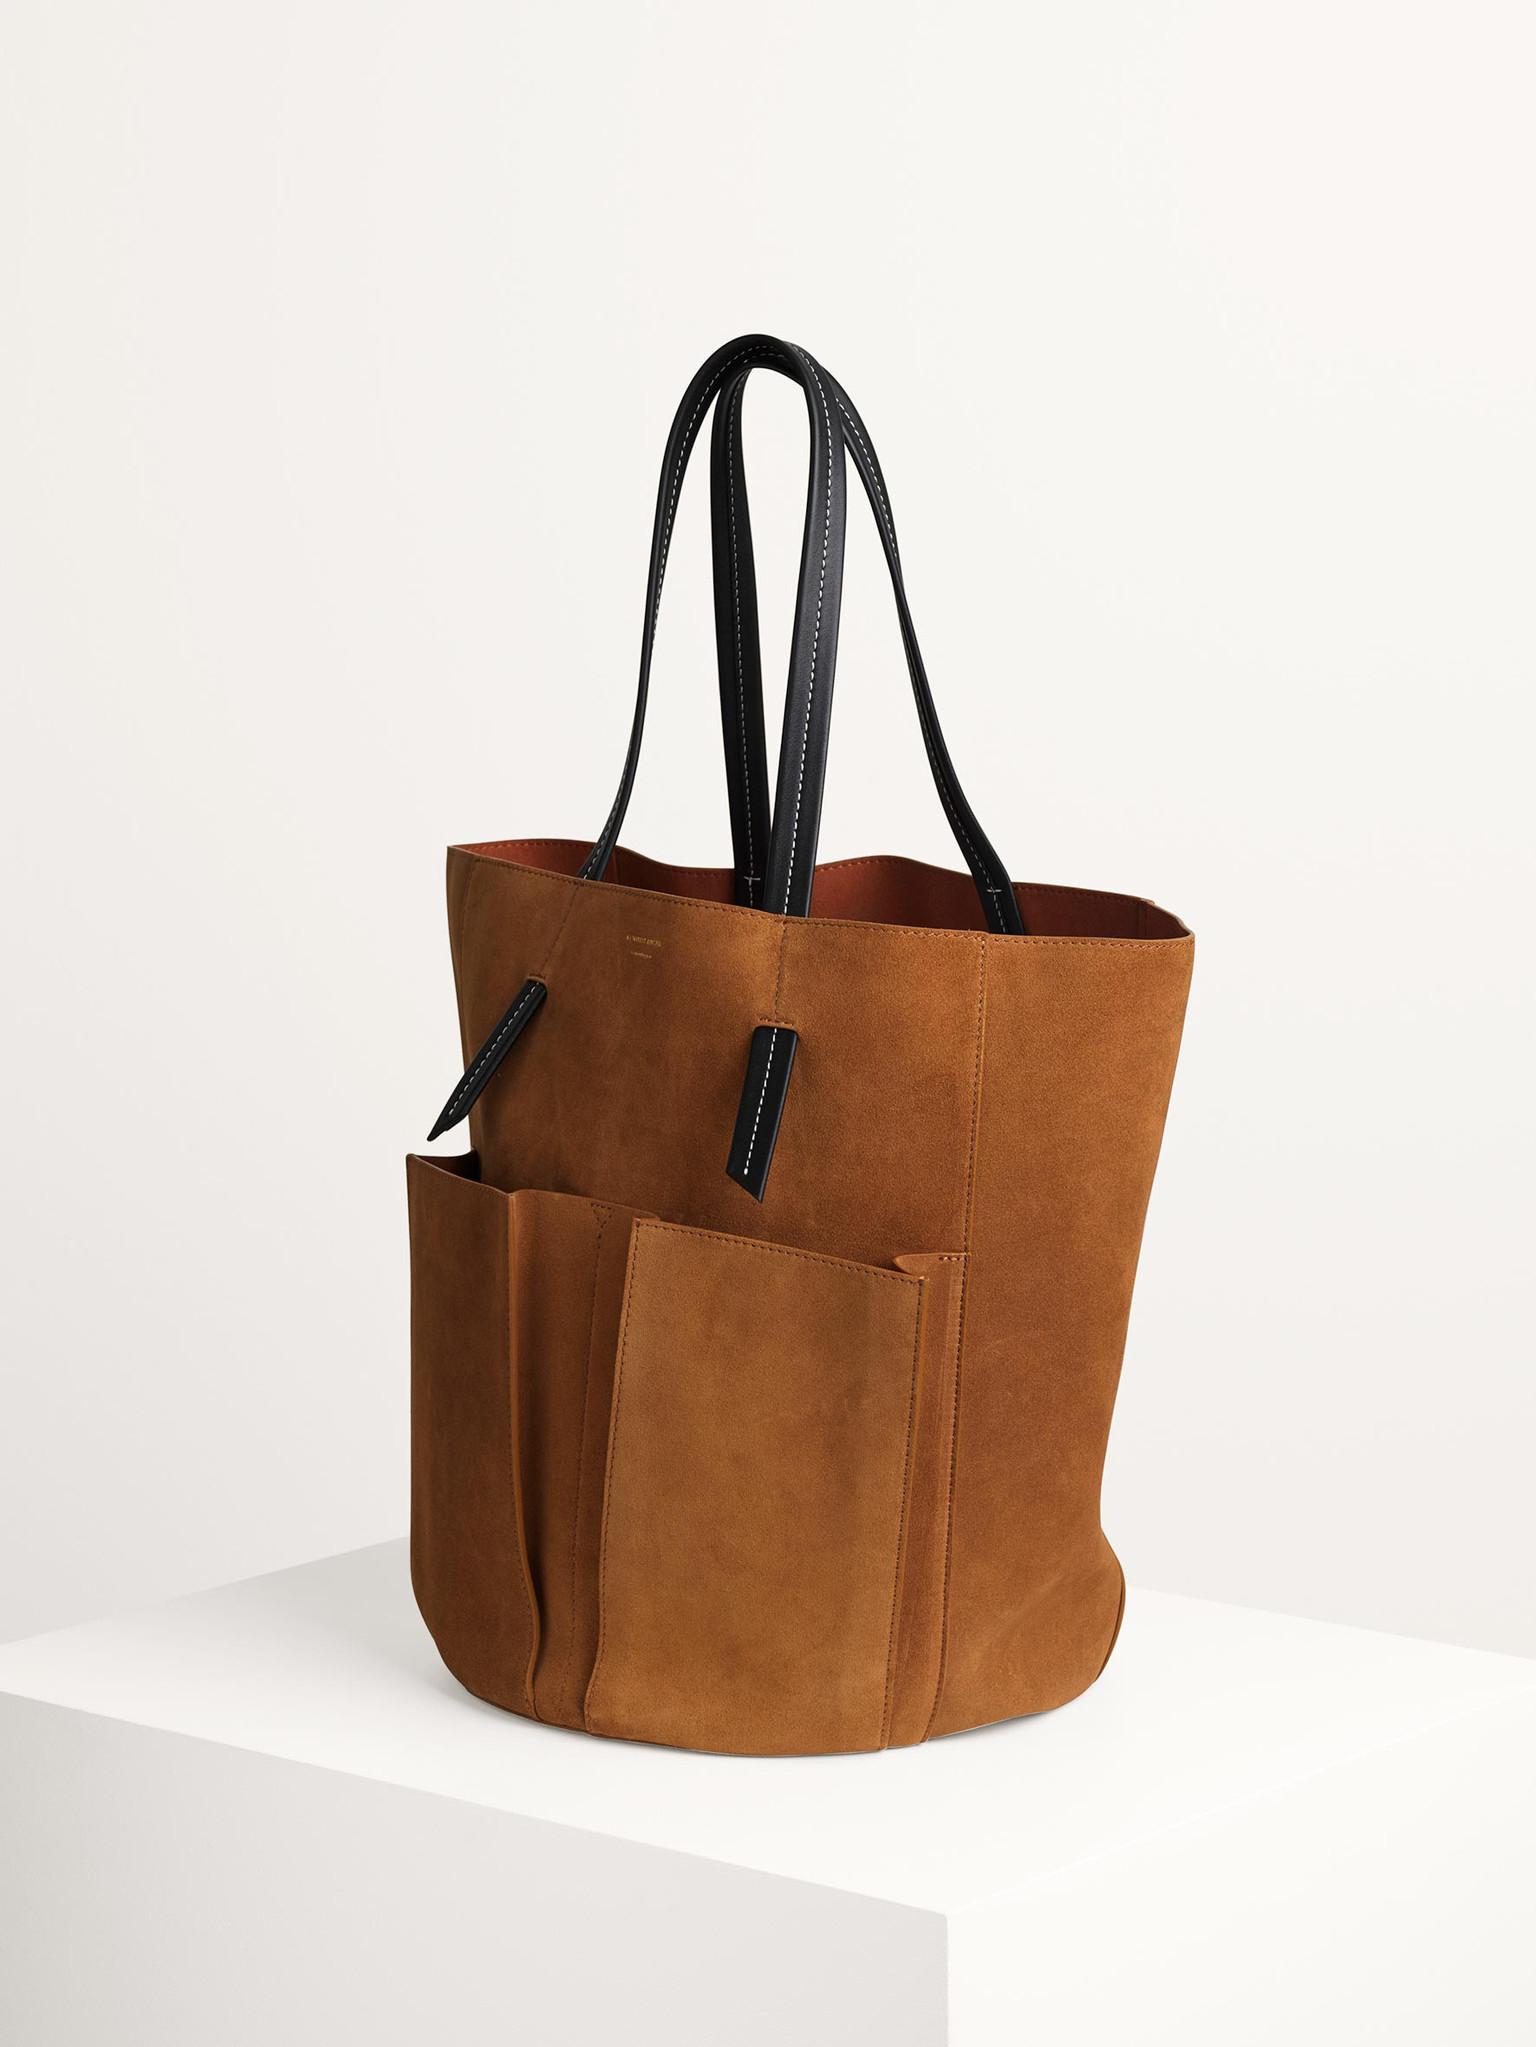 Tess tote bag by malene birger-2